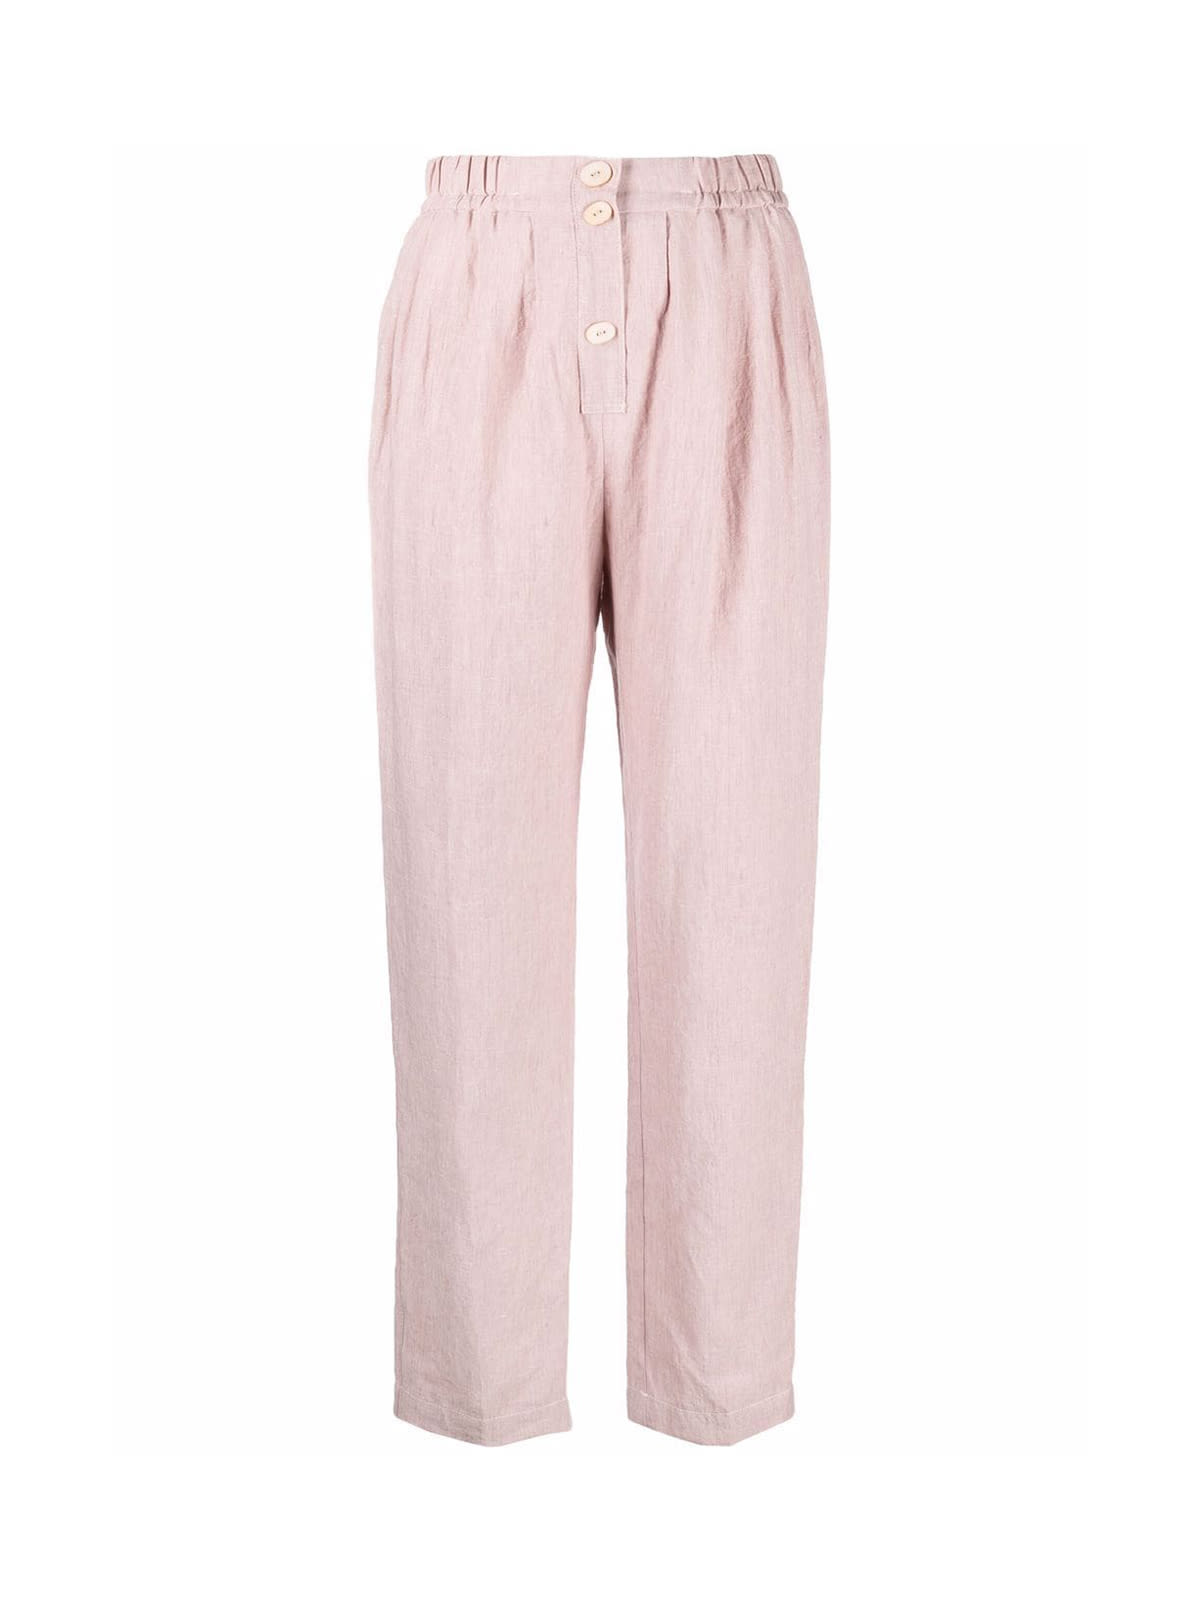 Forte Forte Linen Viscose Elasticated Pants